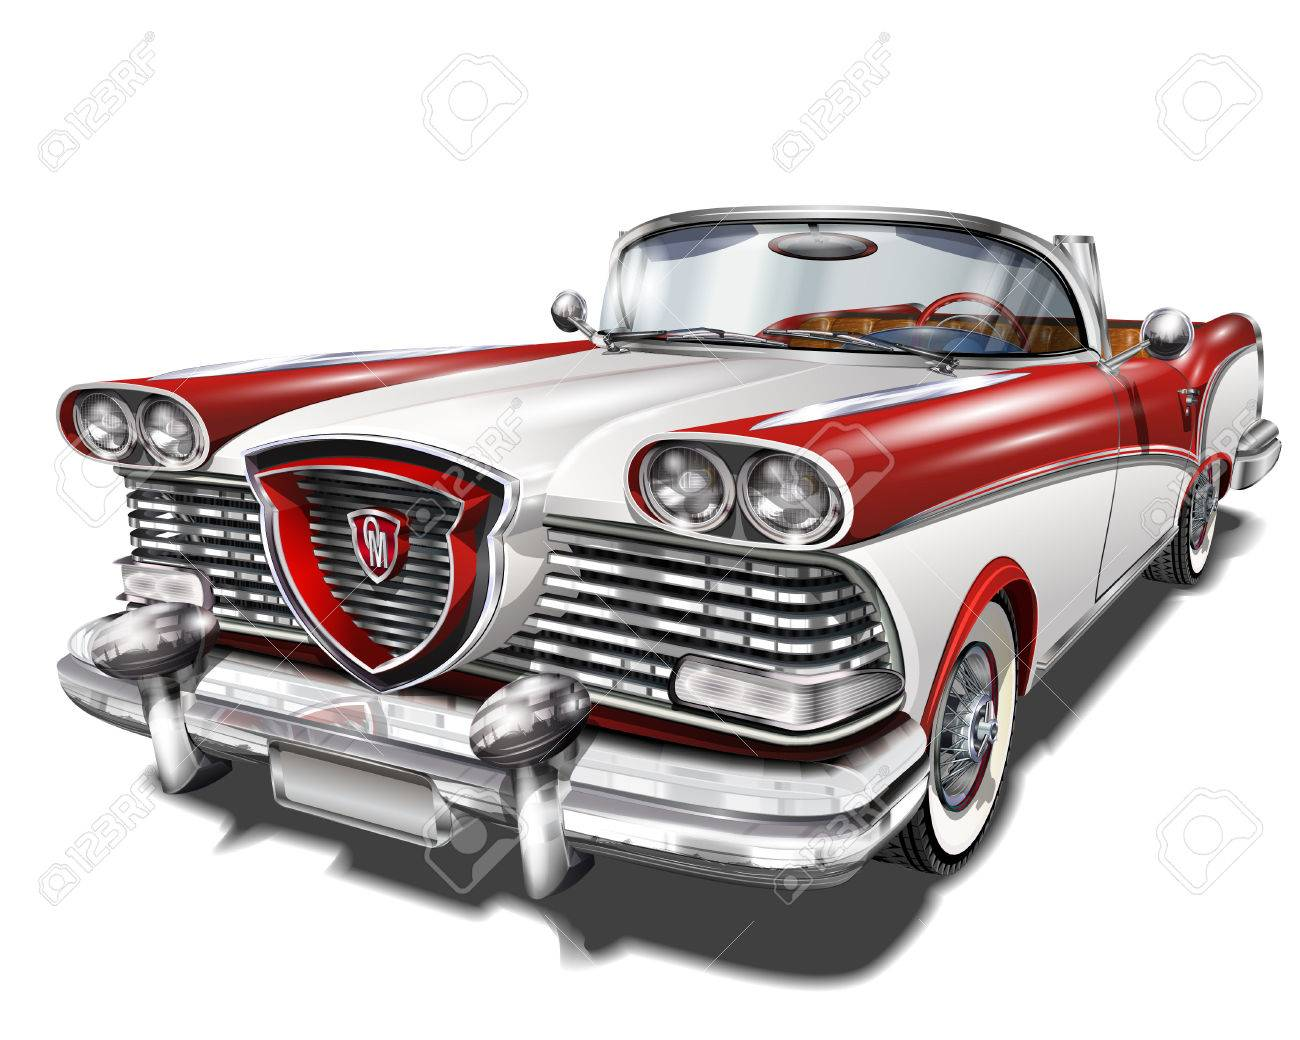 Retro car. - 55952650